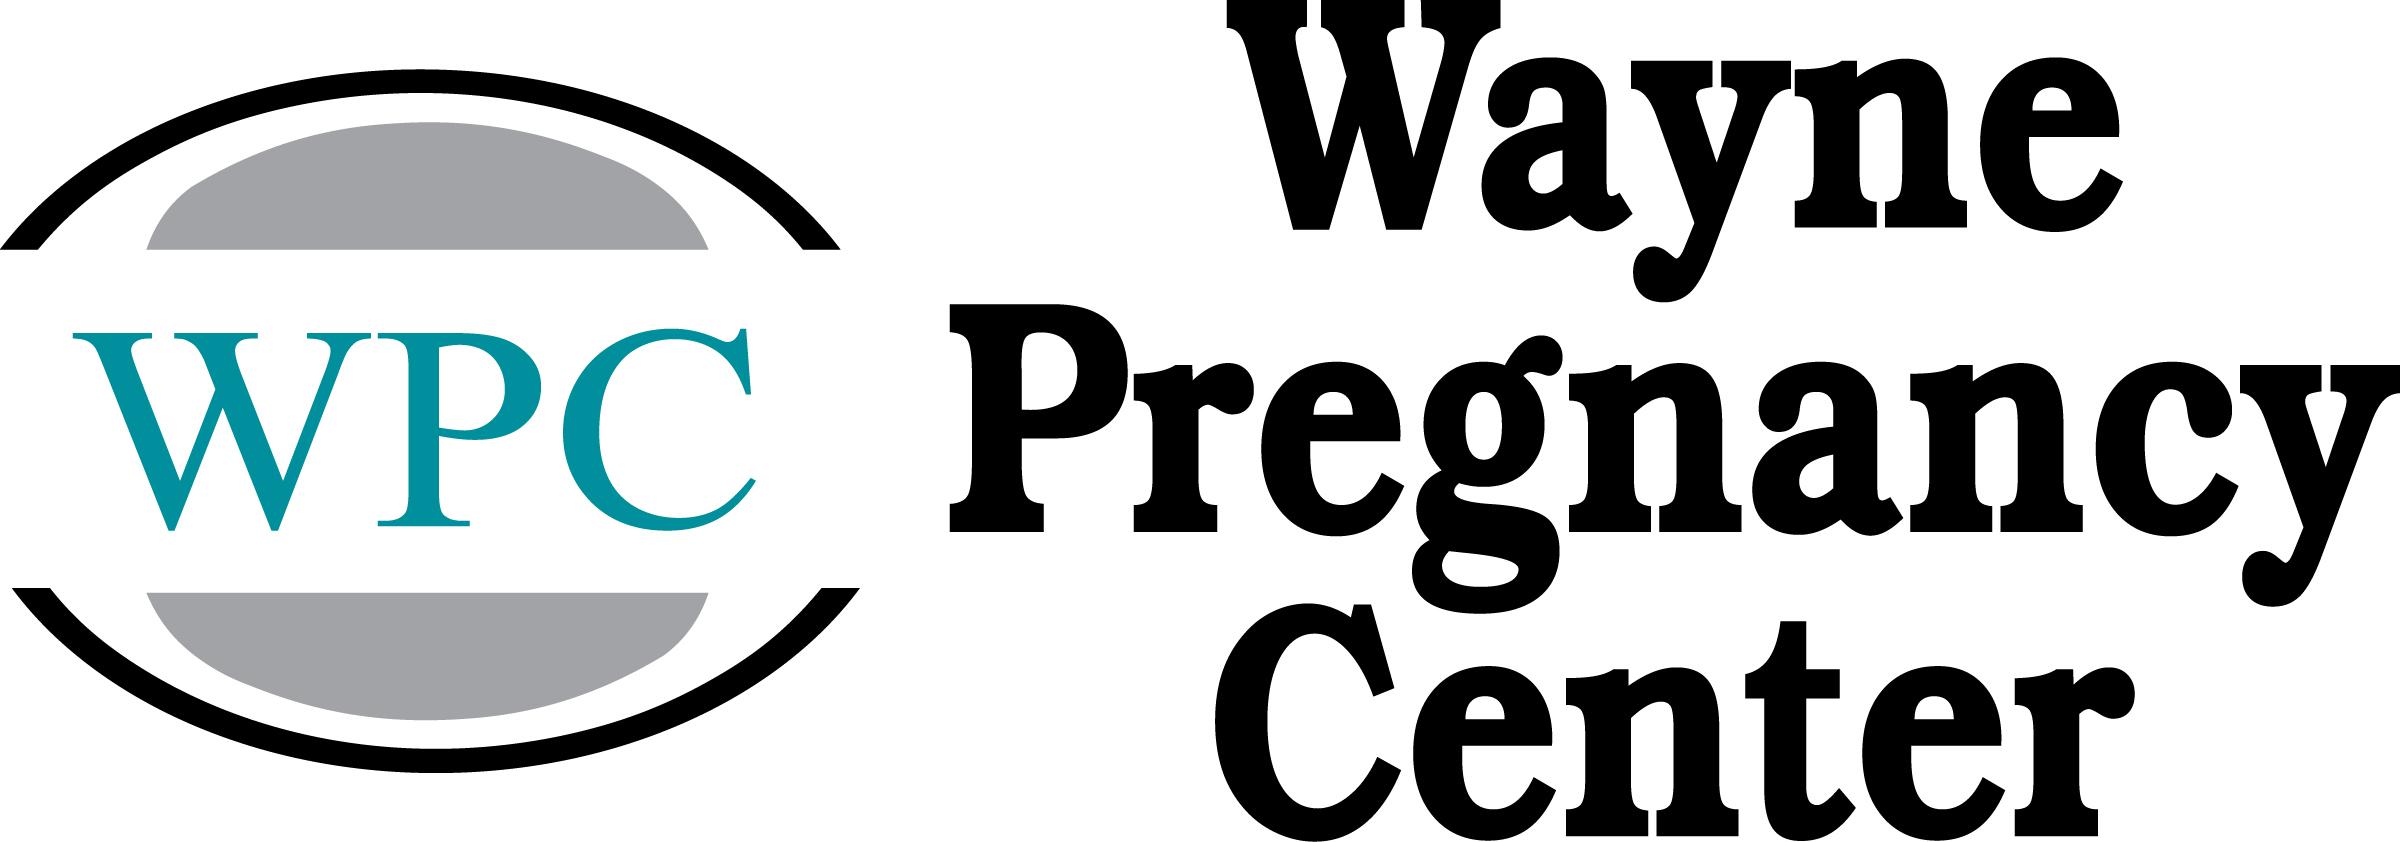 New wpc logo